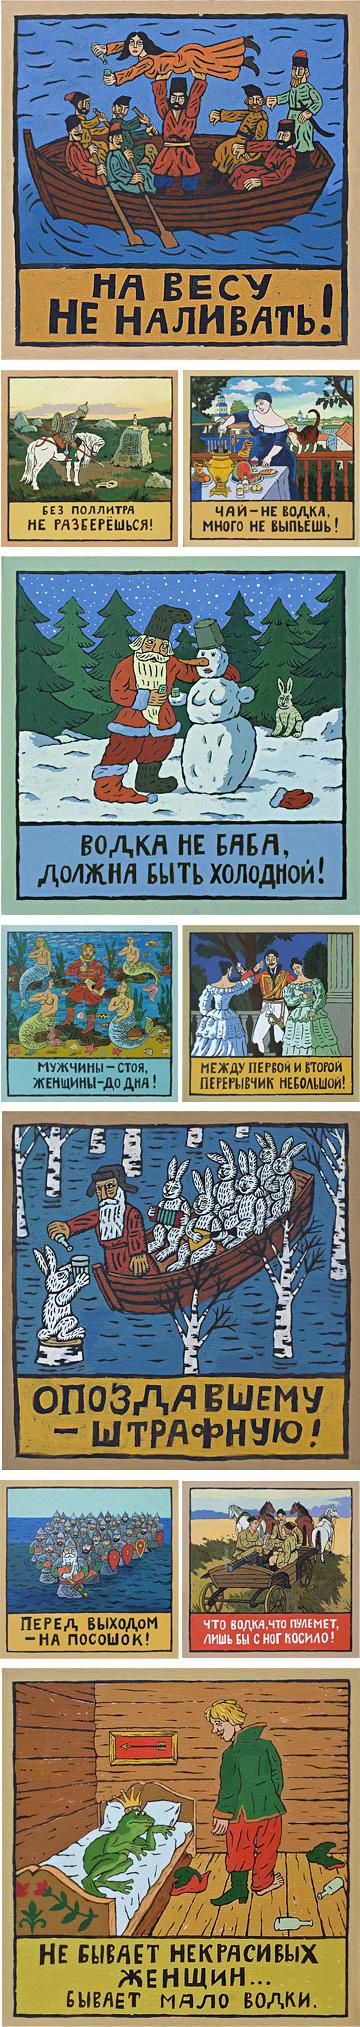 muratov2